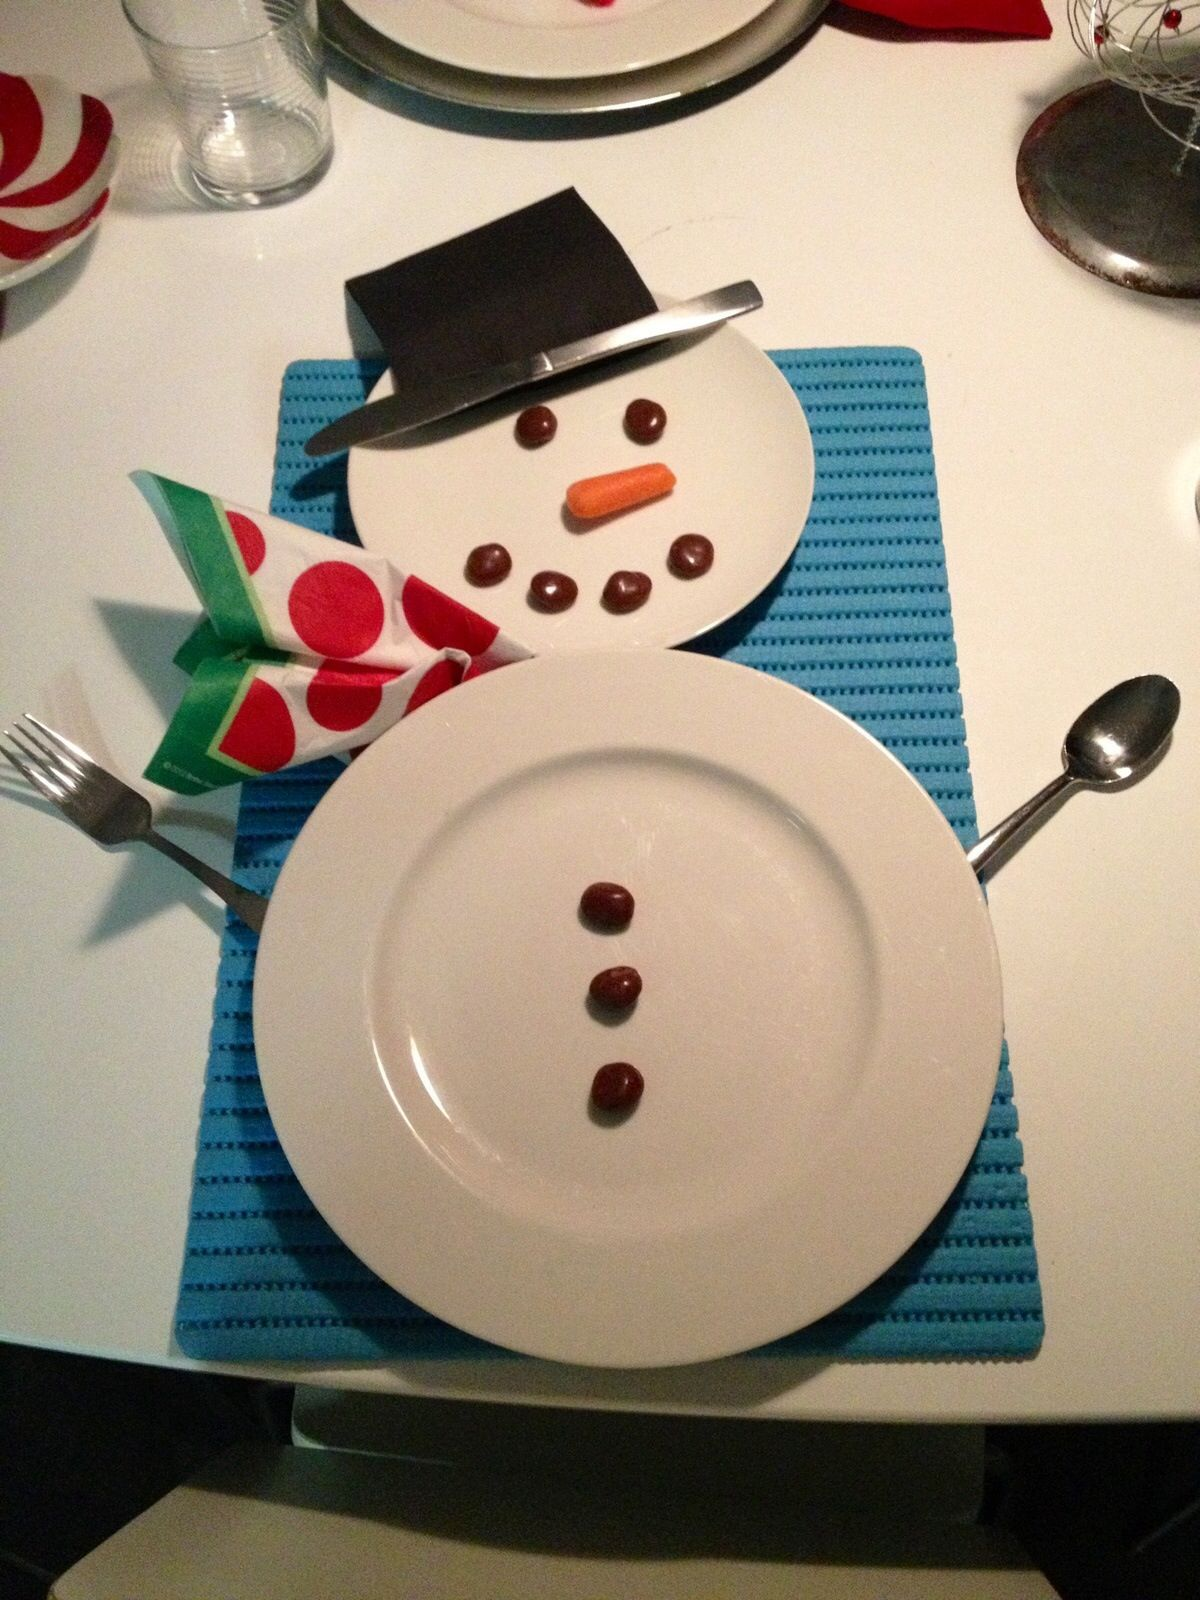 Christmas Place Settings snowman table, snowman place setting, kids christmas snowman, kids